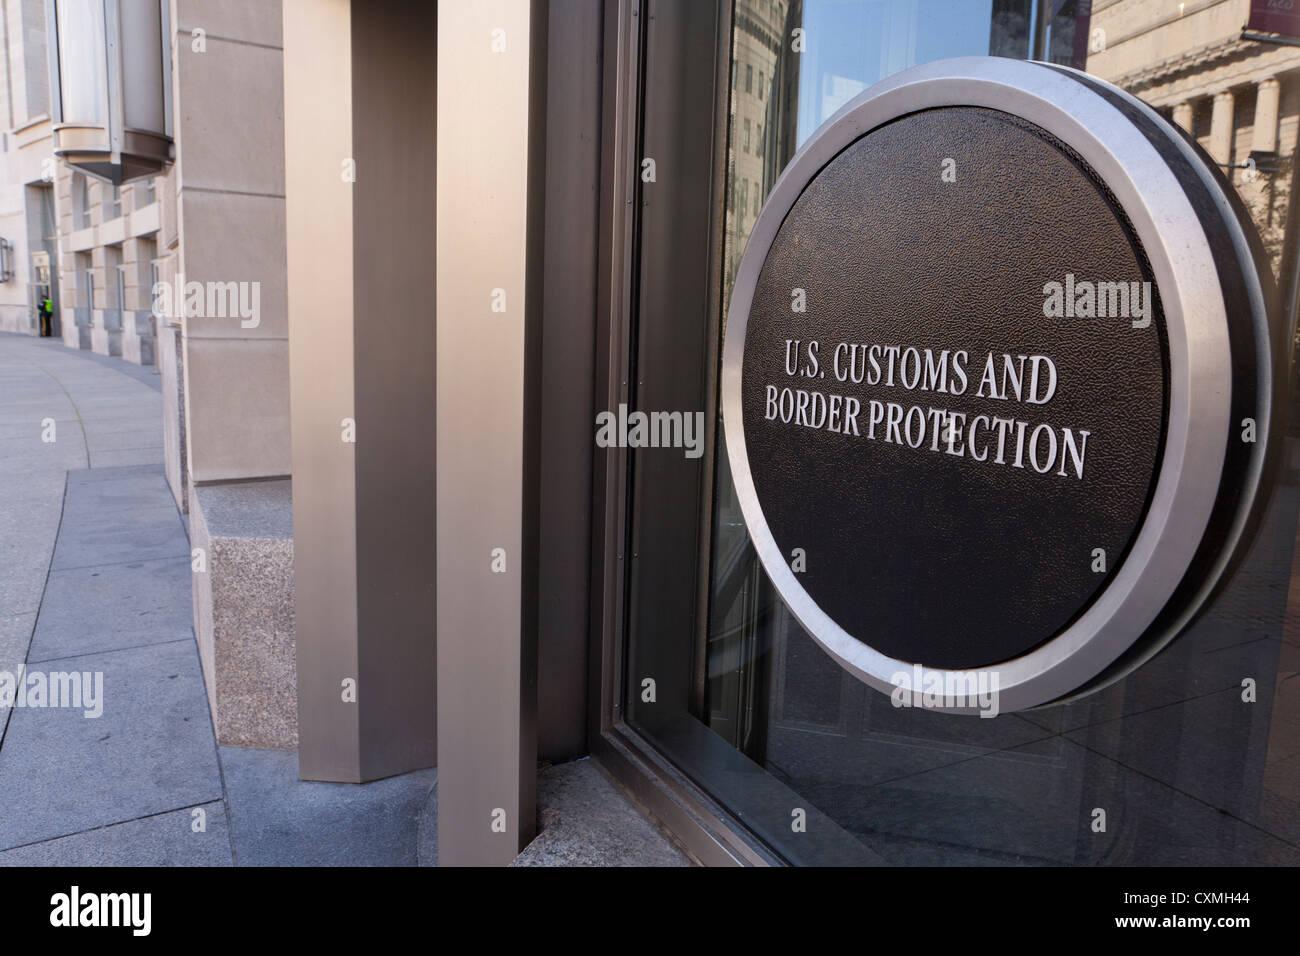 US Customs and Border Protection building entrance sign - Washington, DC USA - Stock Image